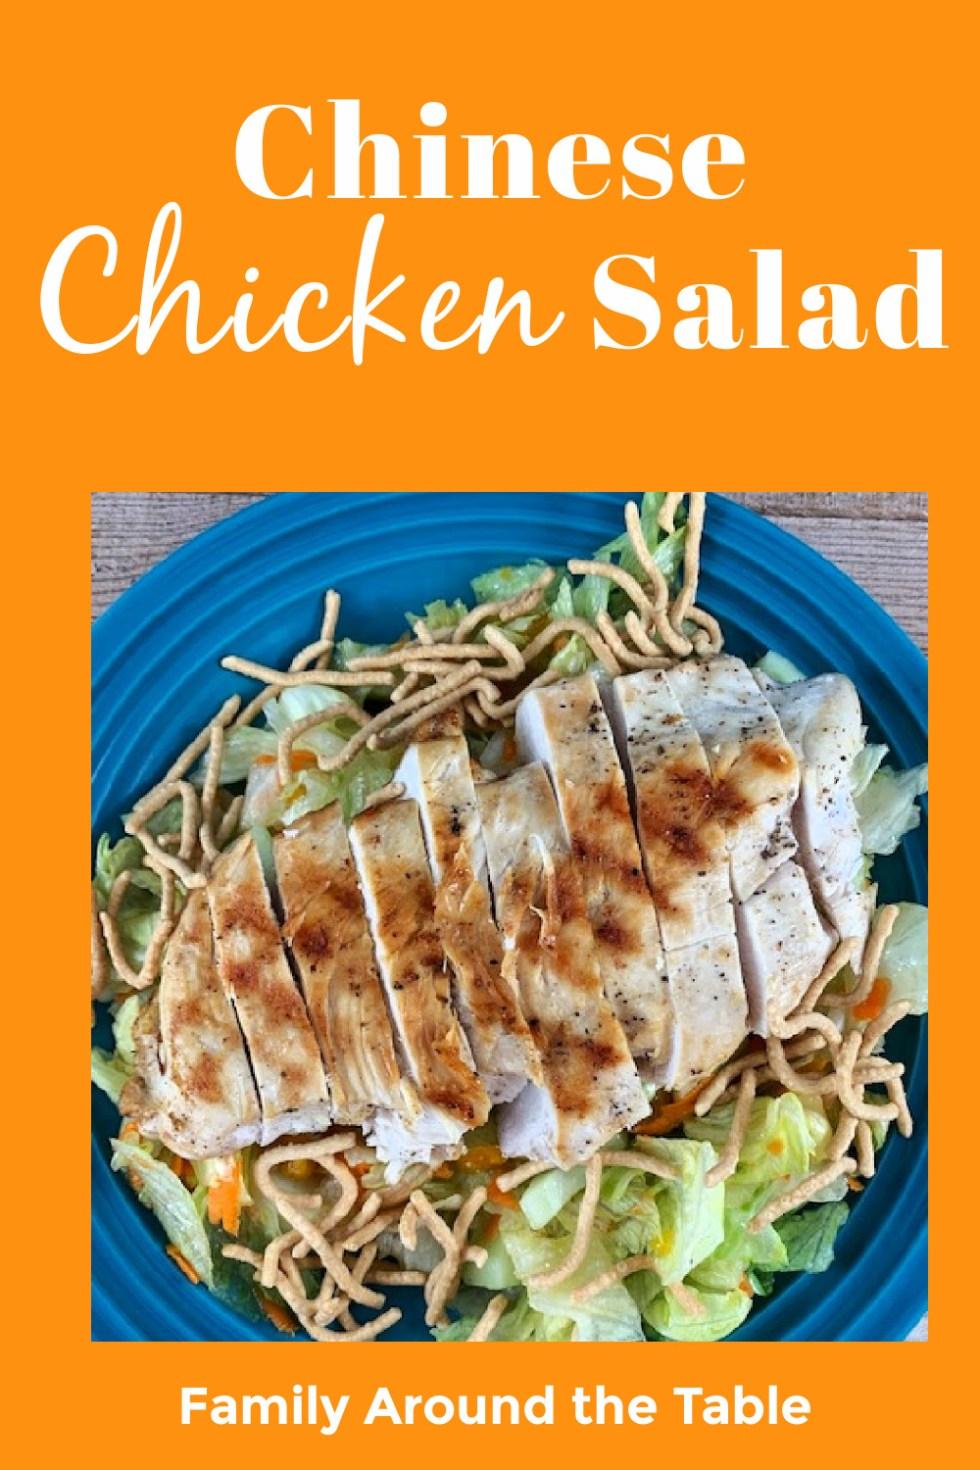 Chinese Chicken Salad Pinterest image.